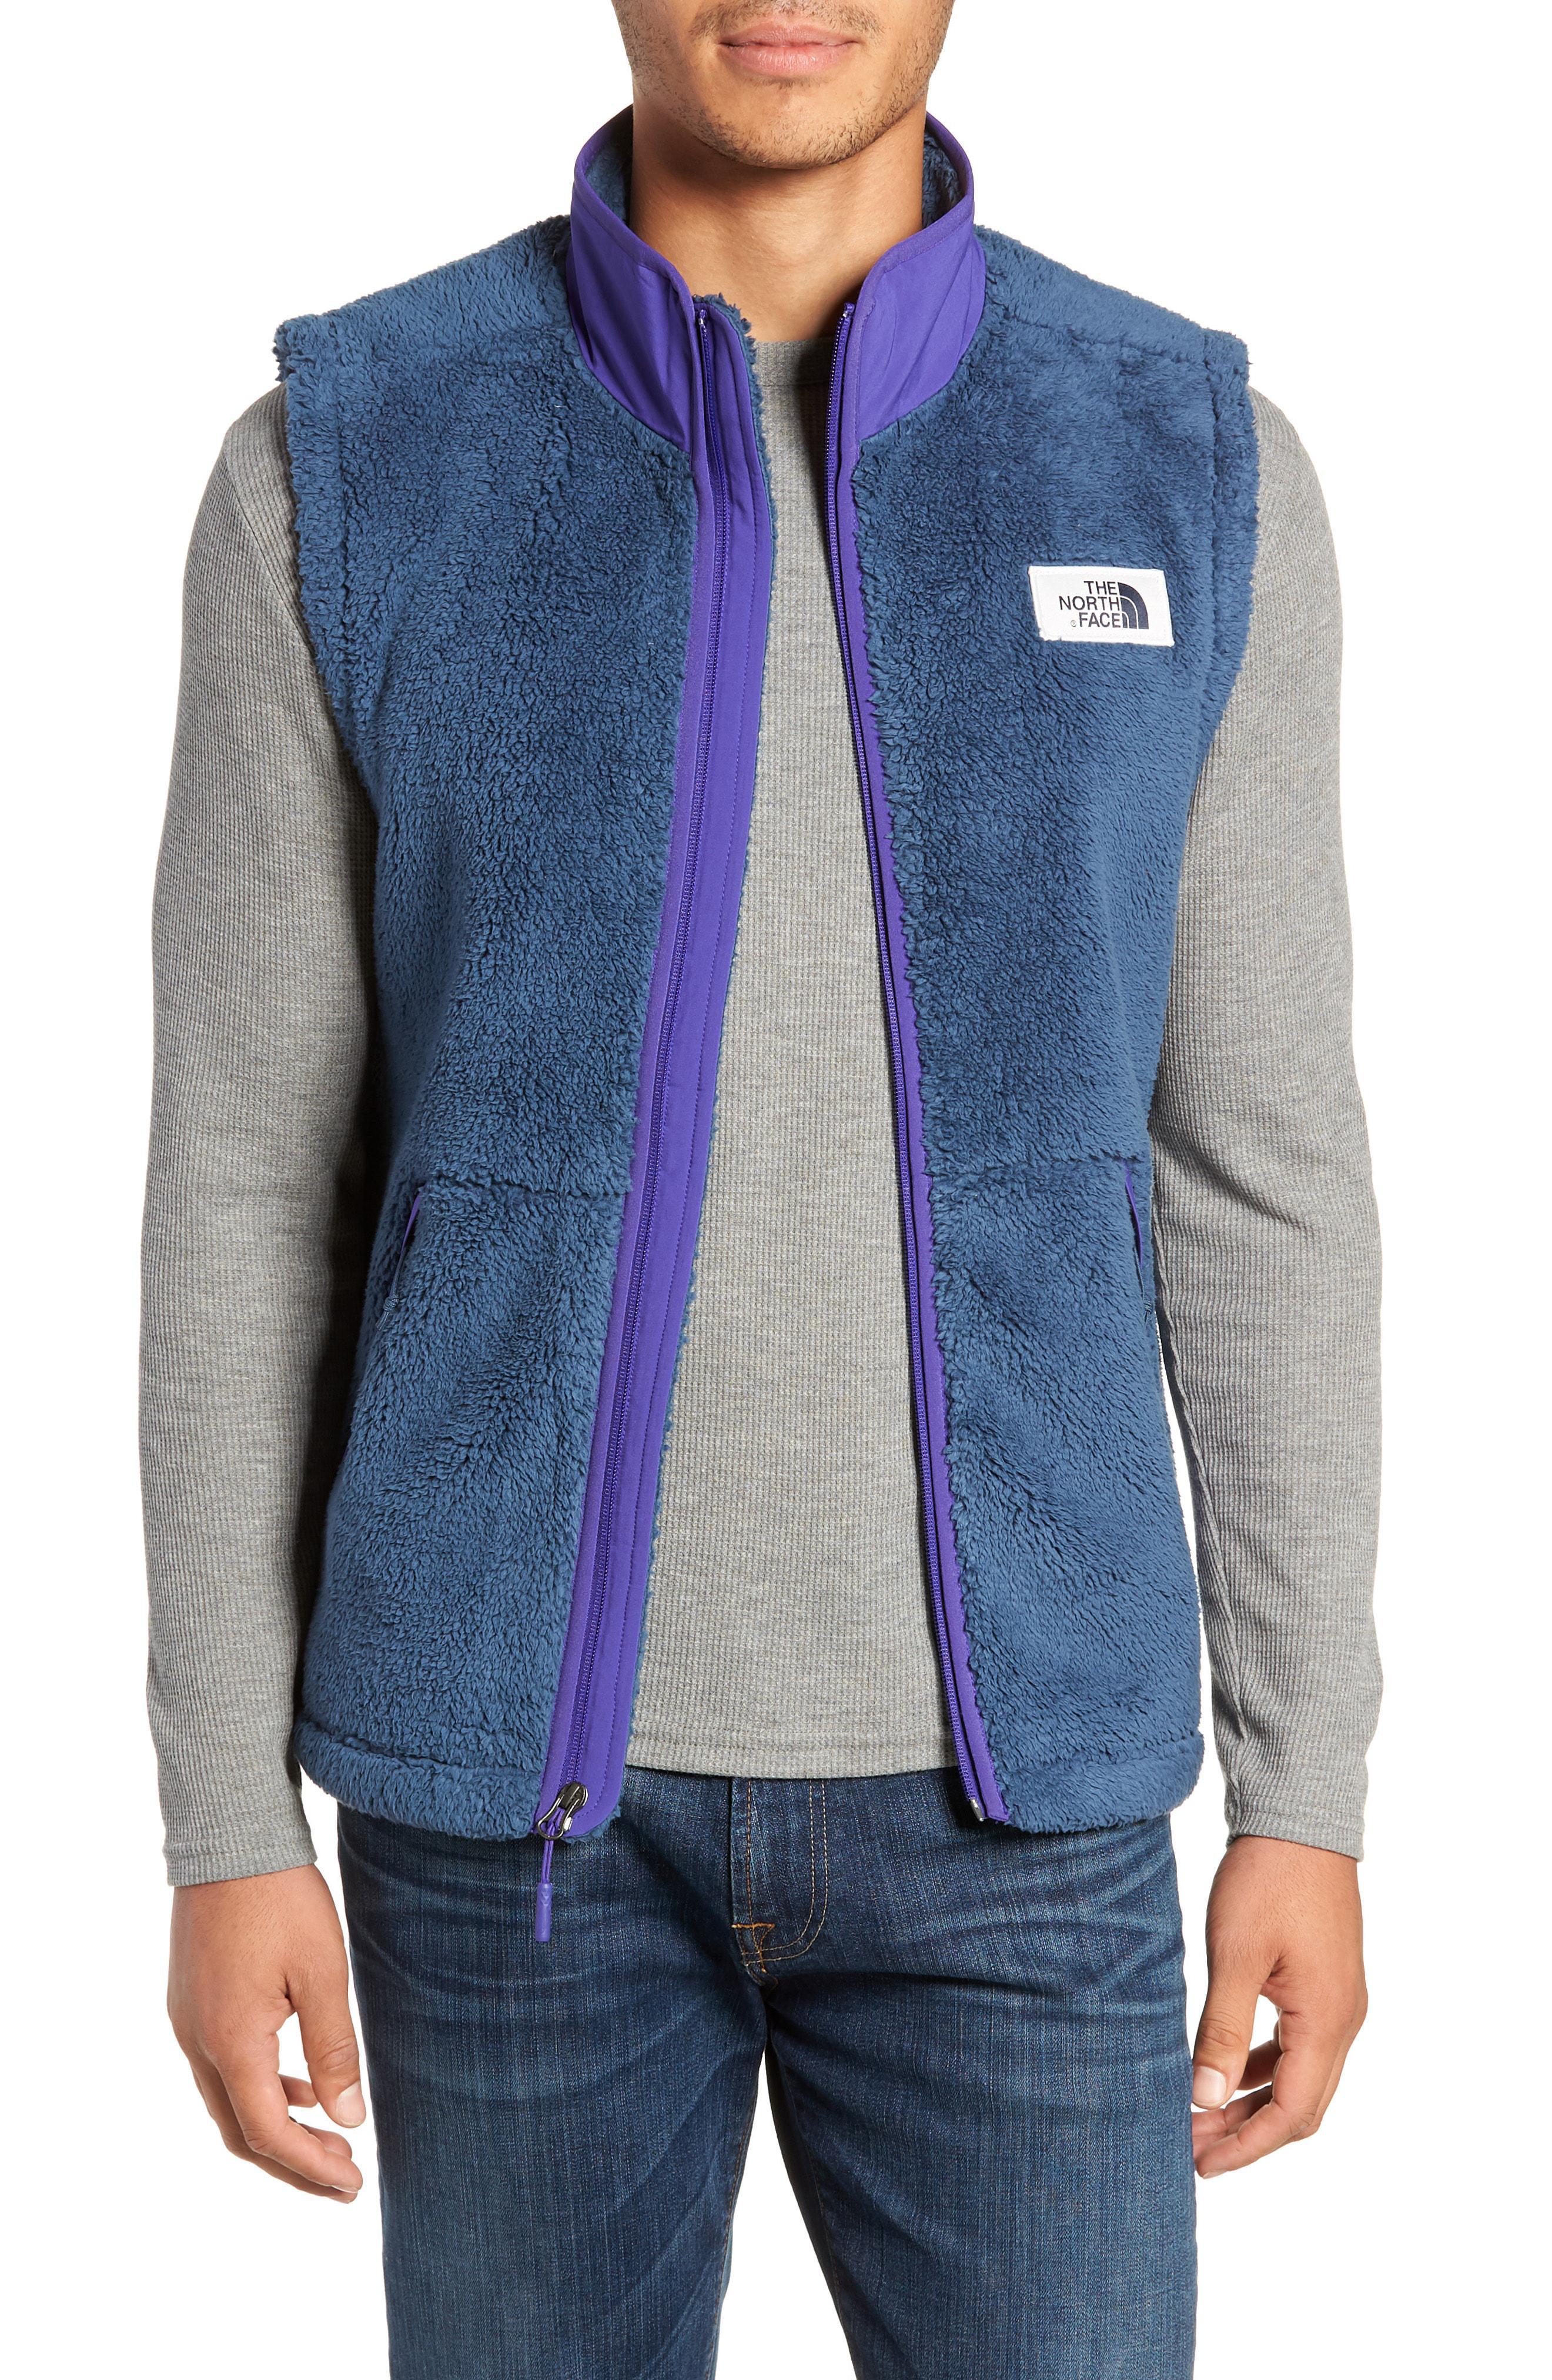 Lyst - The North Face Campshire Fleece Vest in Blue for Men - Save 40% fec5da22b